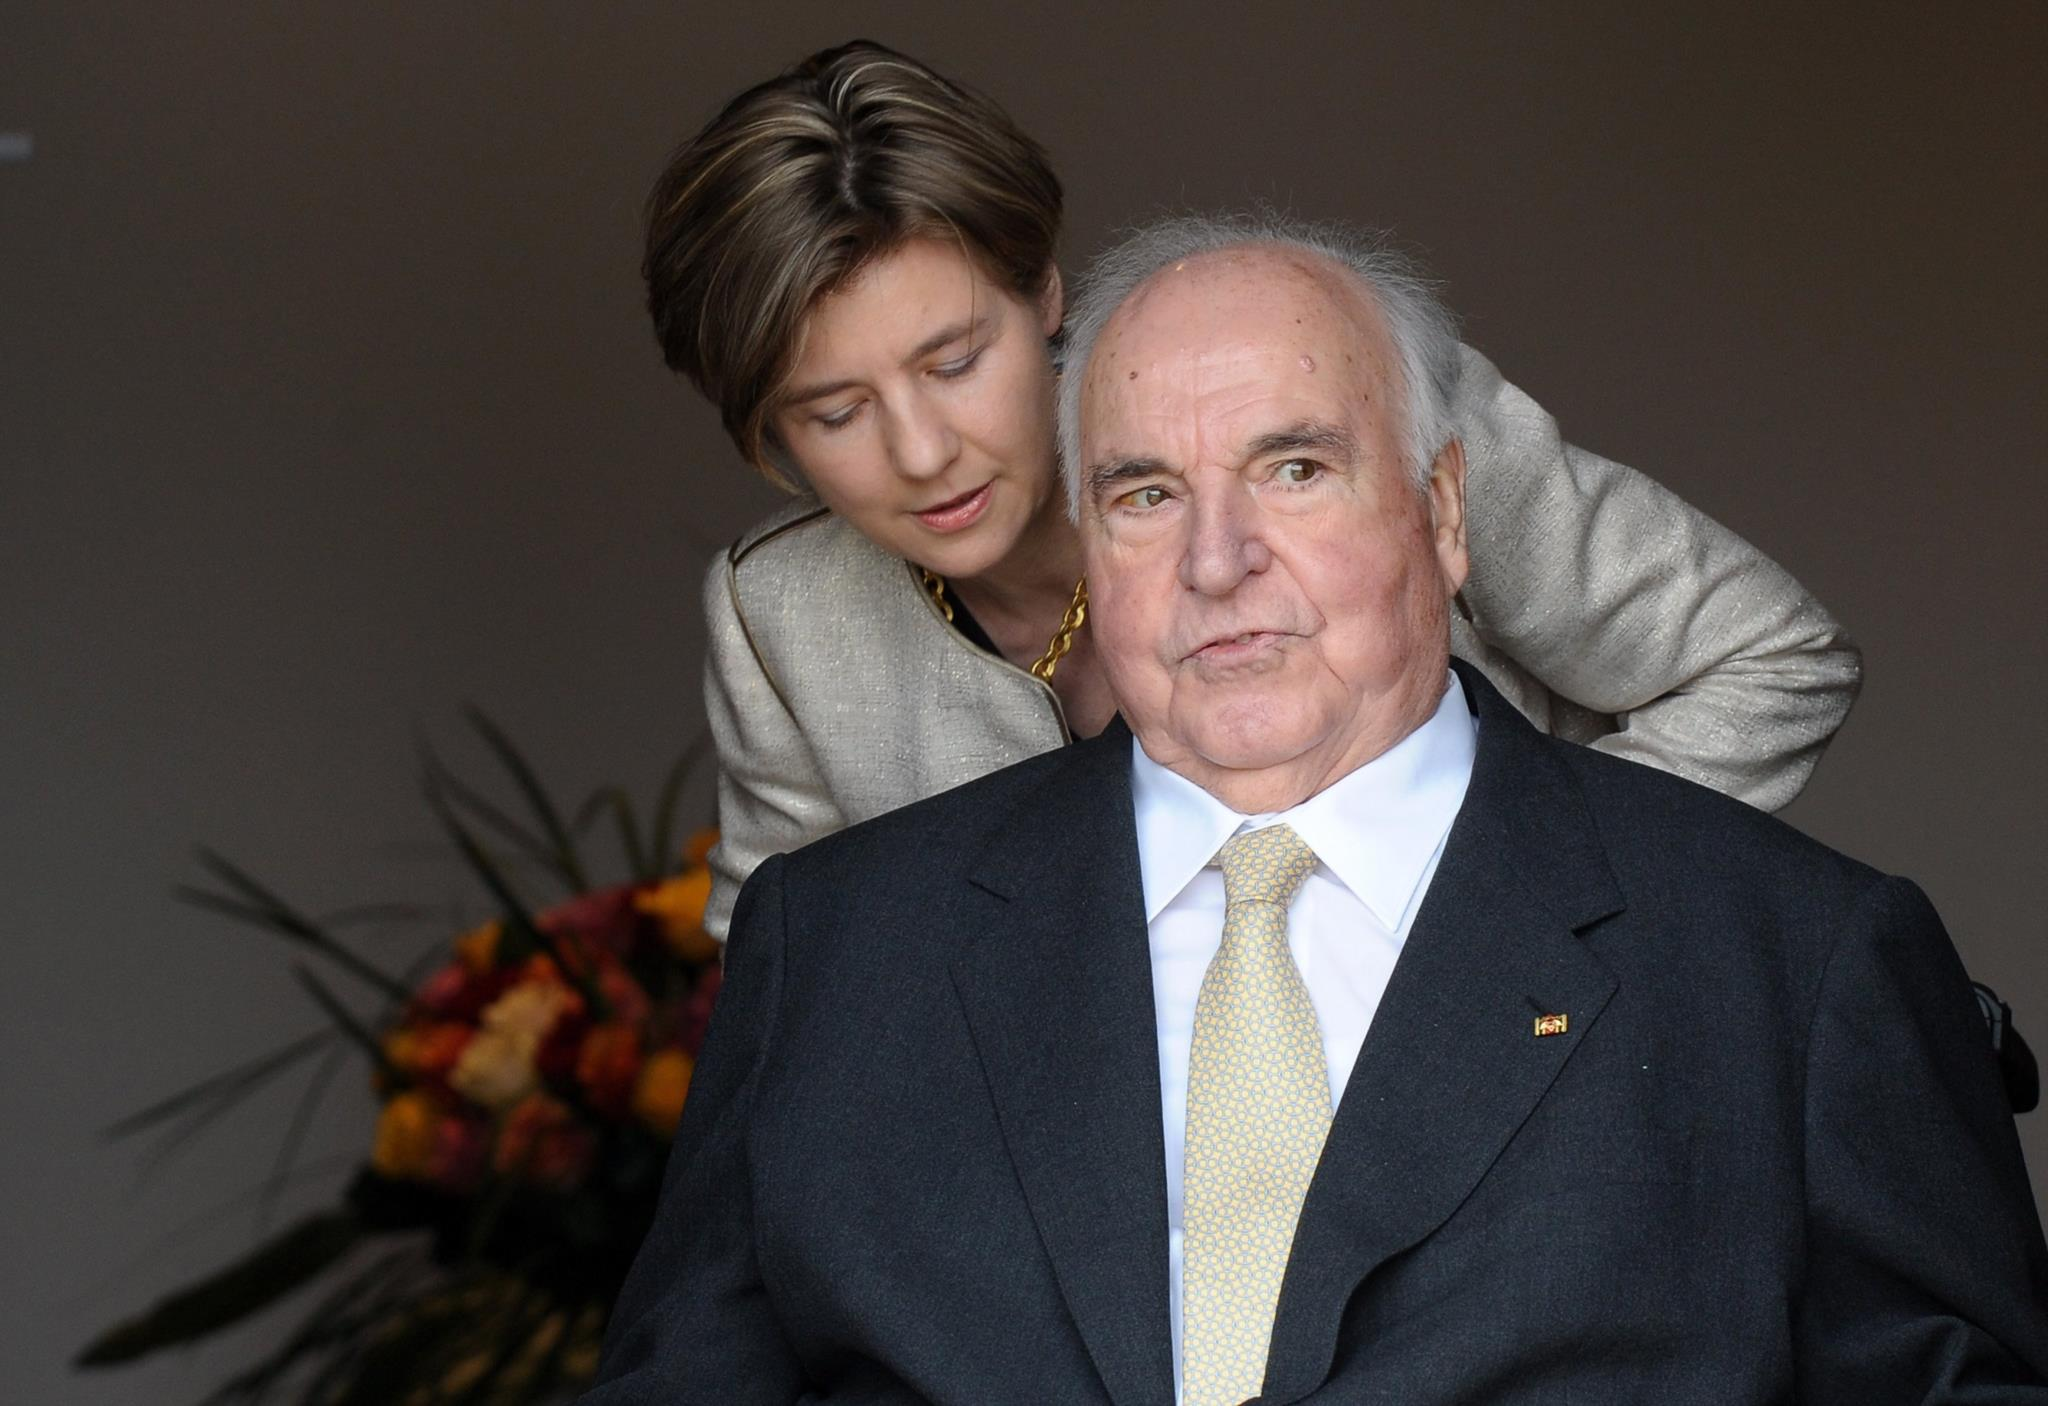 PÚBLICO - Viúva de Helmut Kohl queria Orbán, e não Merkel, a discursar no funeral